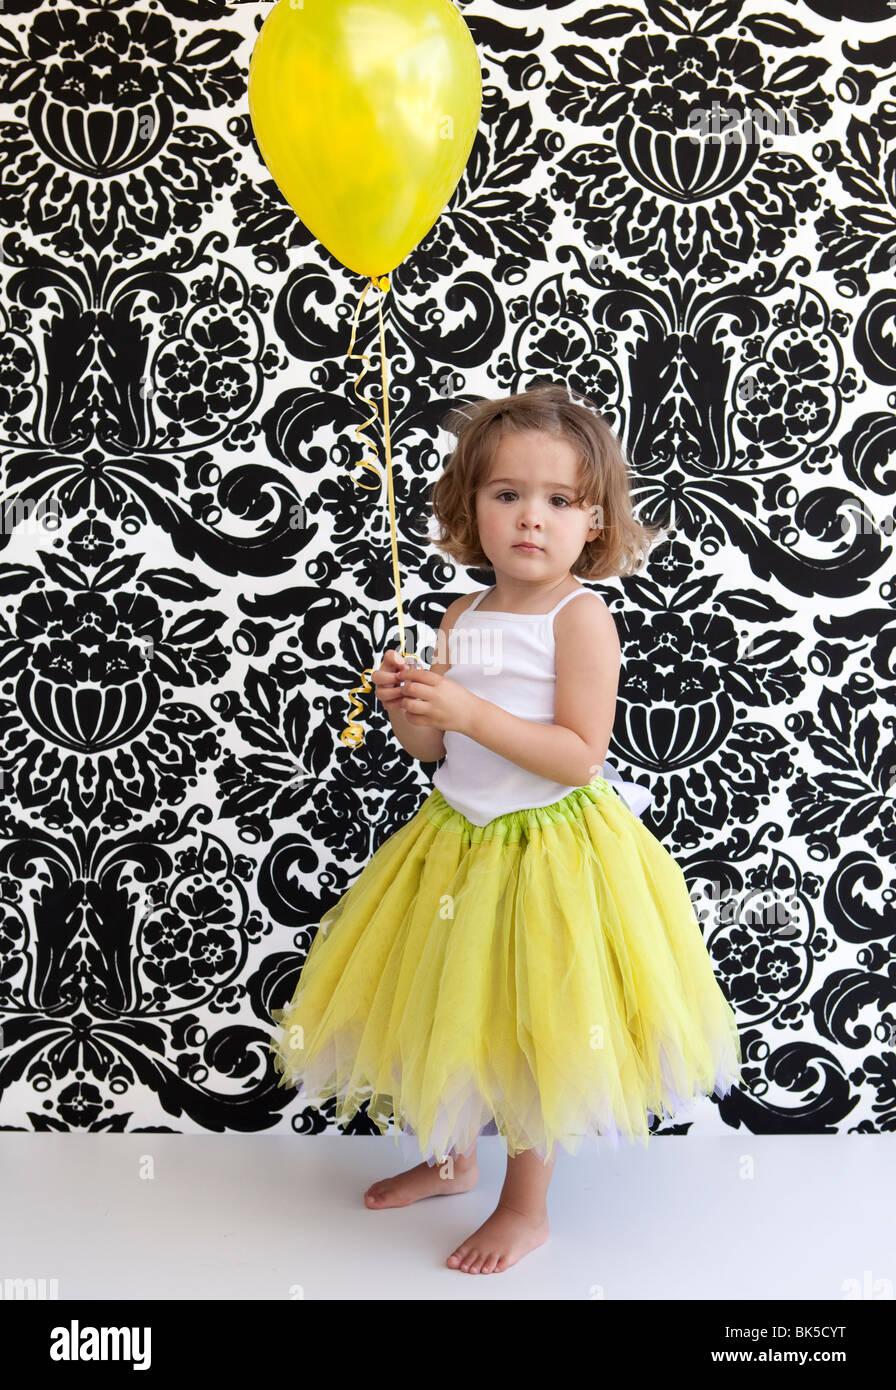 Petite fille aux ballons et tutu jaune Photo Stock